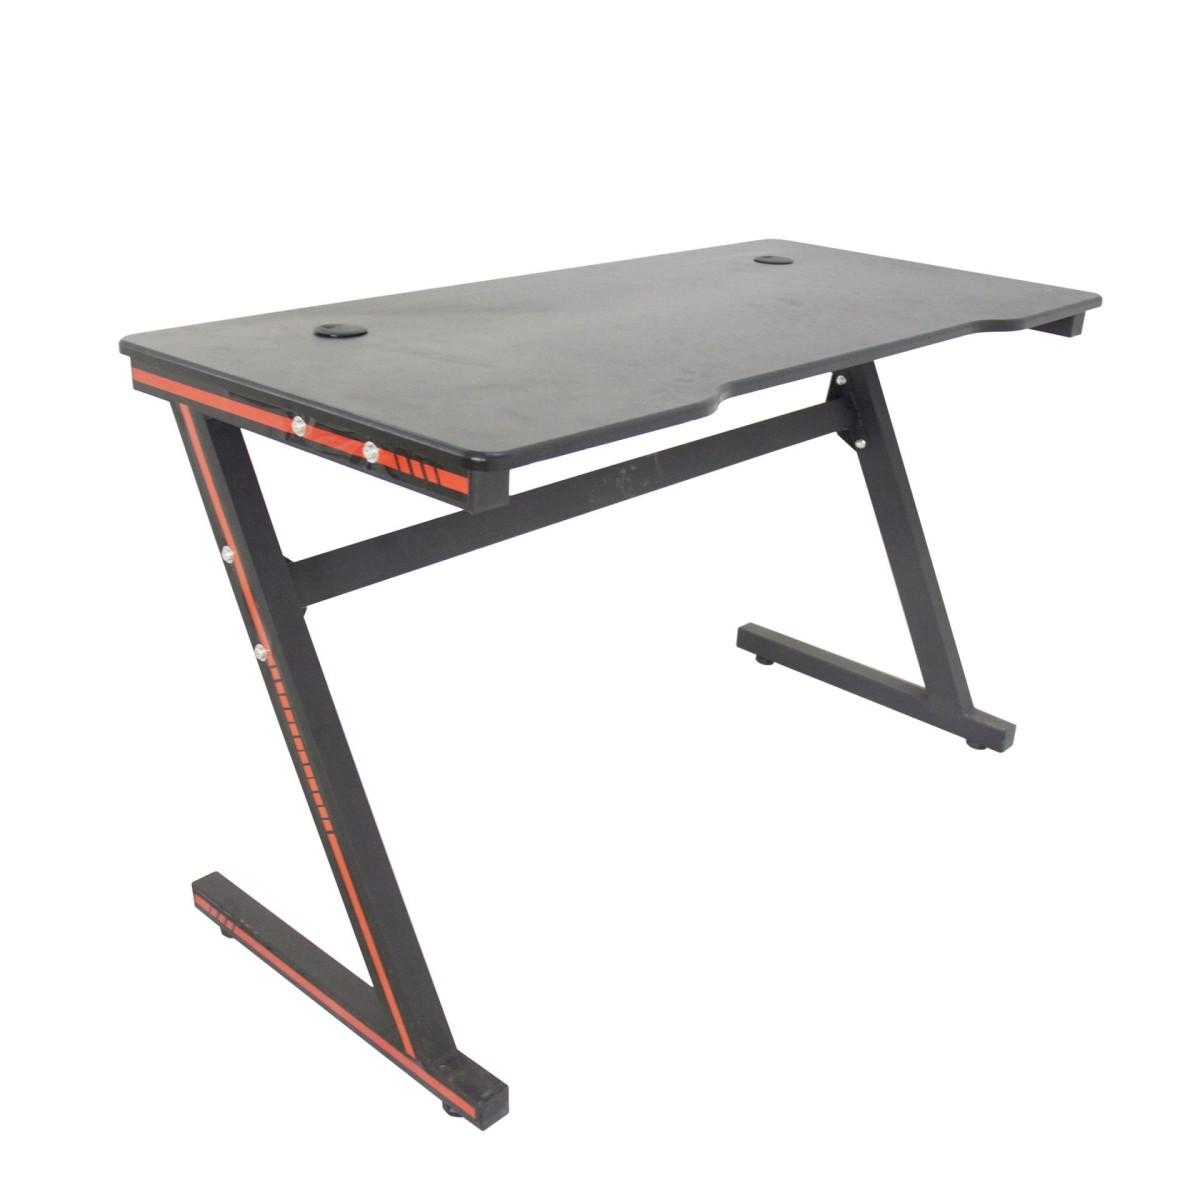 Herný stôl ZIKO 2.0 čierny